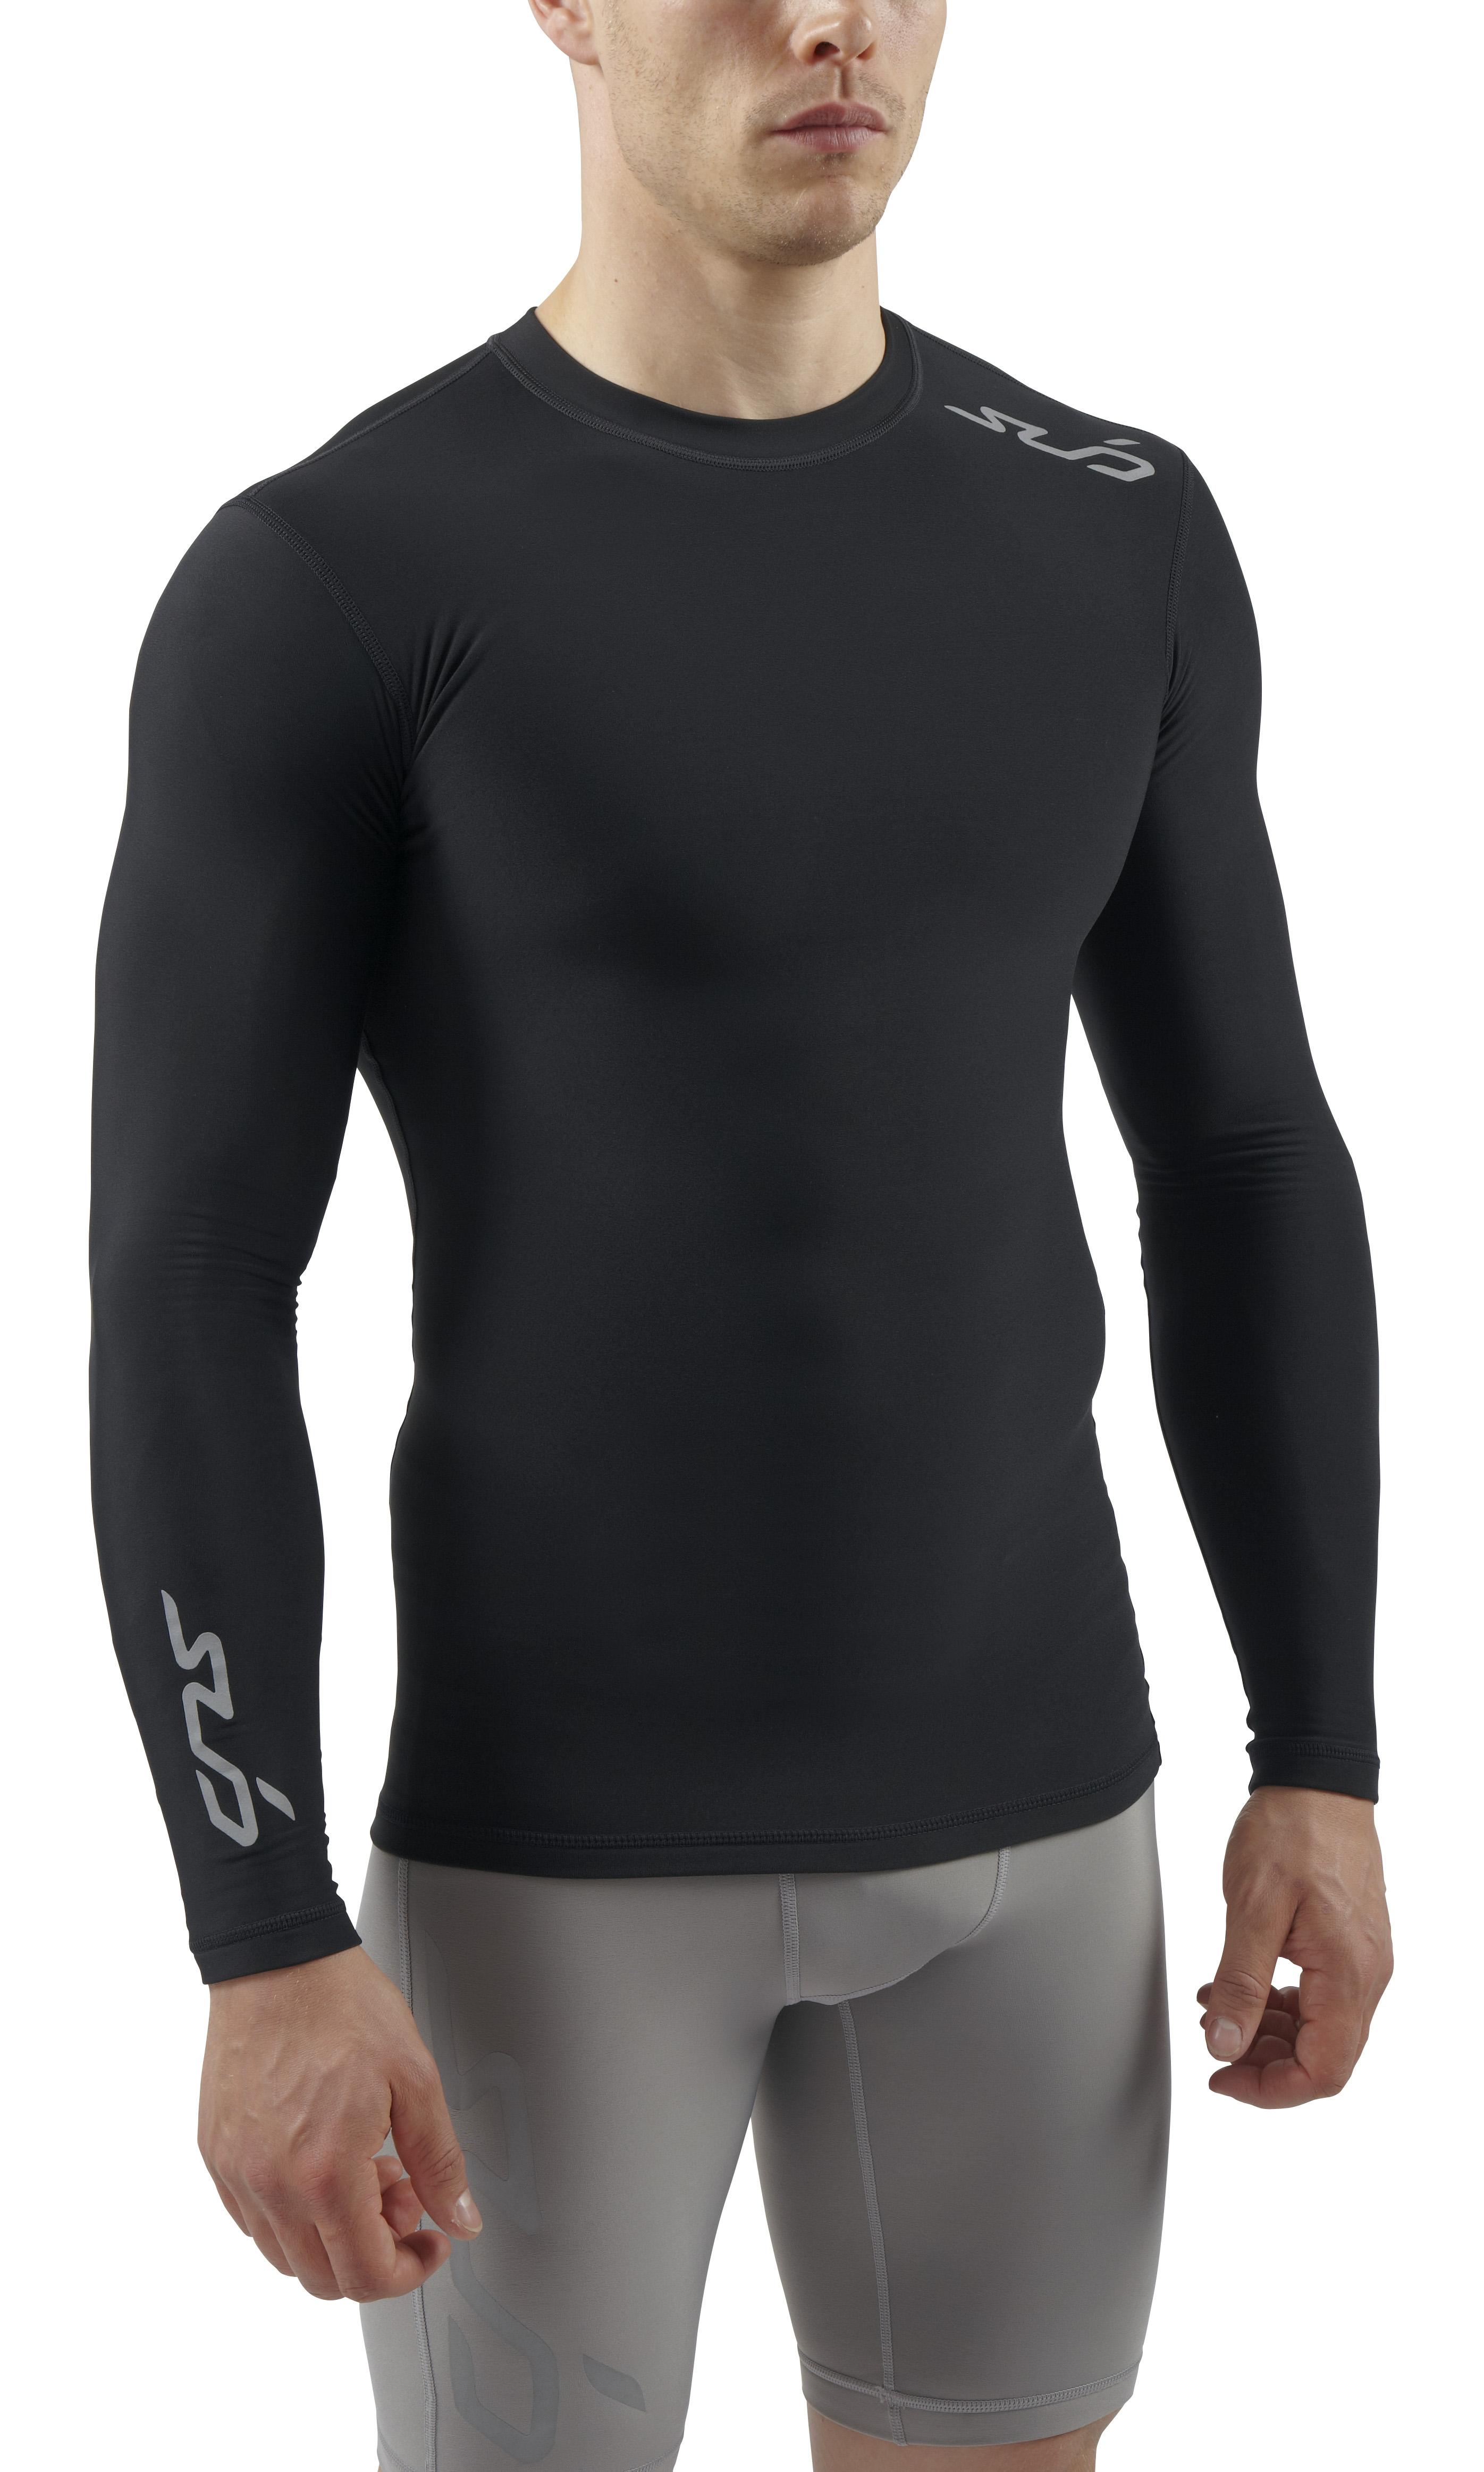 Sub-Sports-Mens-Winter-Warm-Vest-Crew-Neck-Long-Sleeve-Thermal-Base-Layer-Fleece